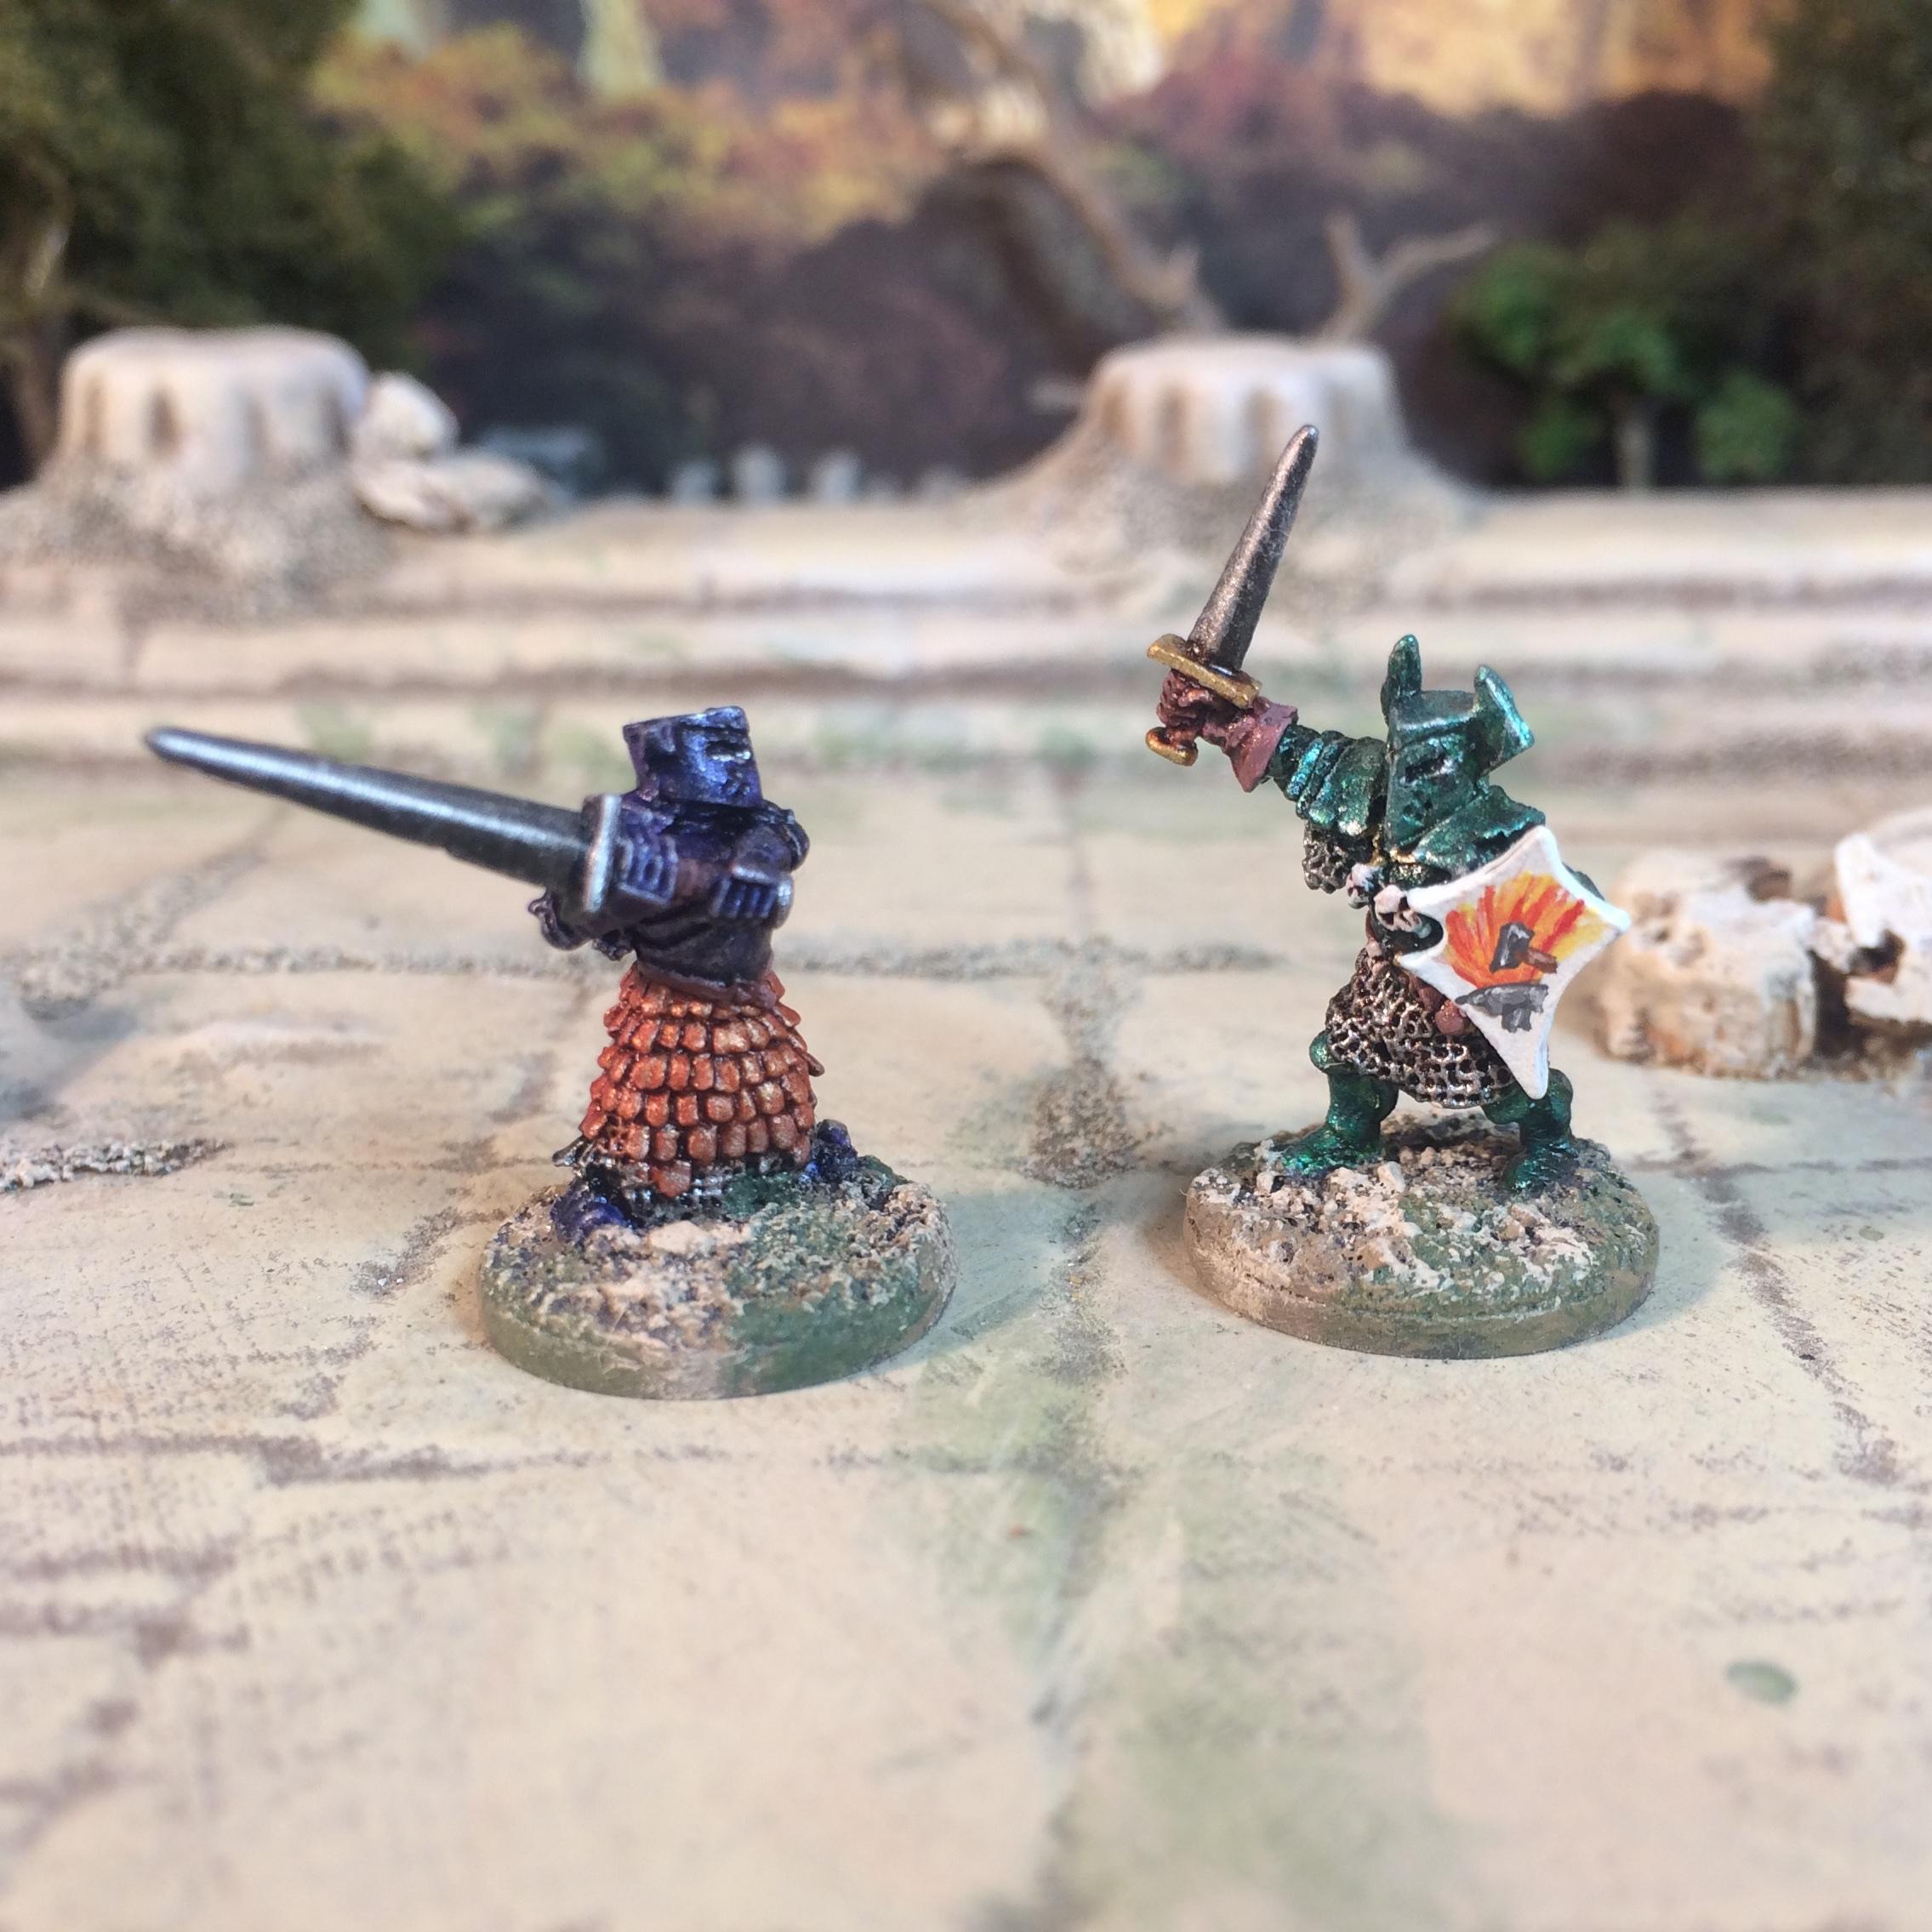 15mm 18mm Demonworld fantasy miniatures ral parth europe